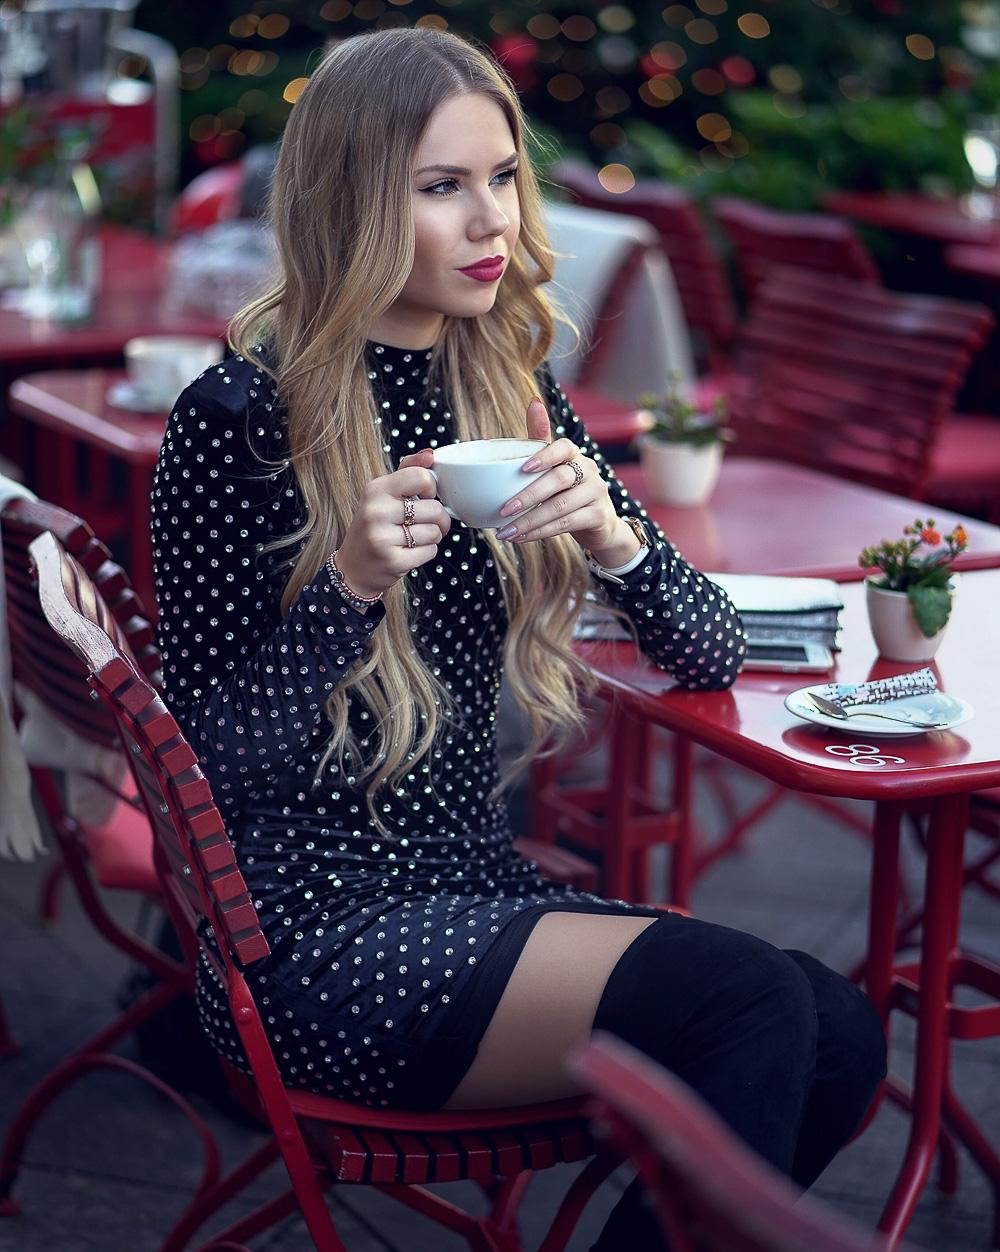 Fashionblog-Glitzerkleid-mit-Overknees